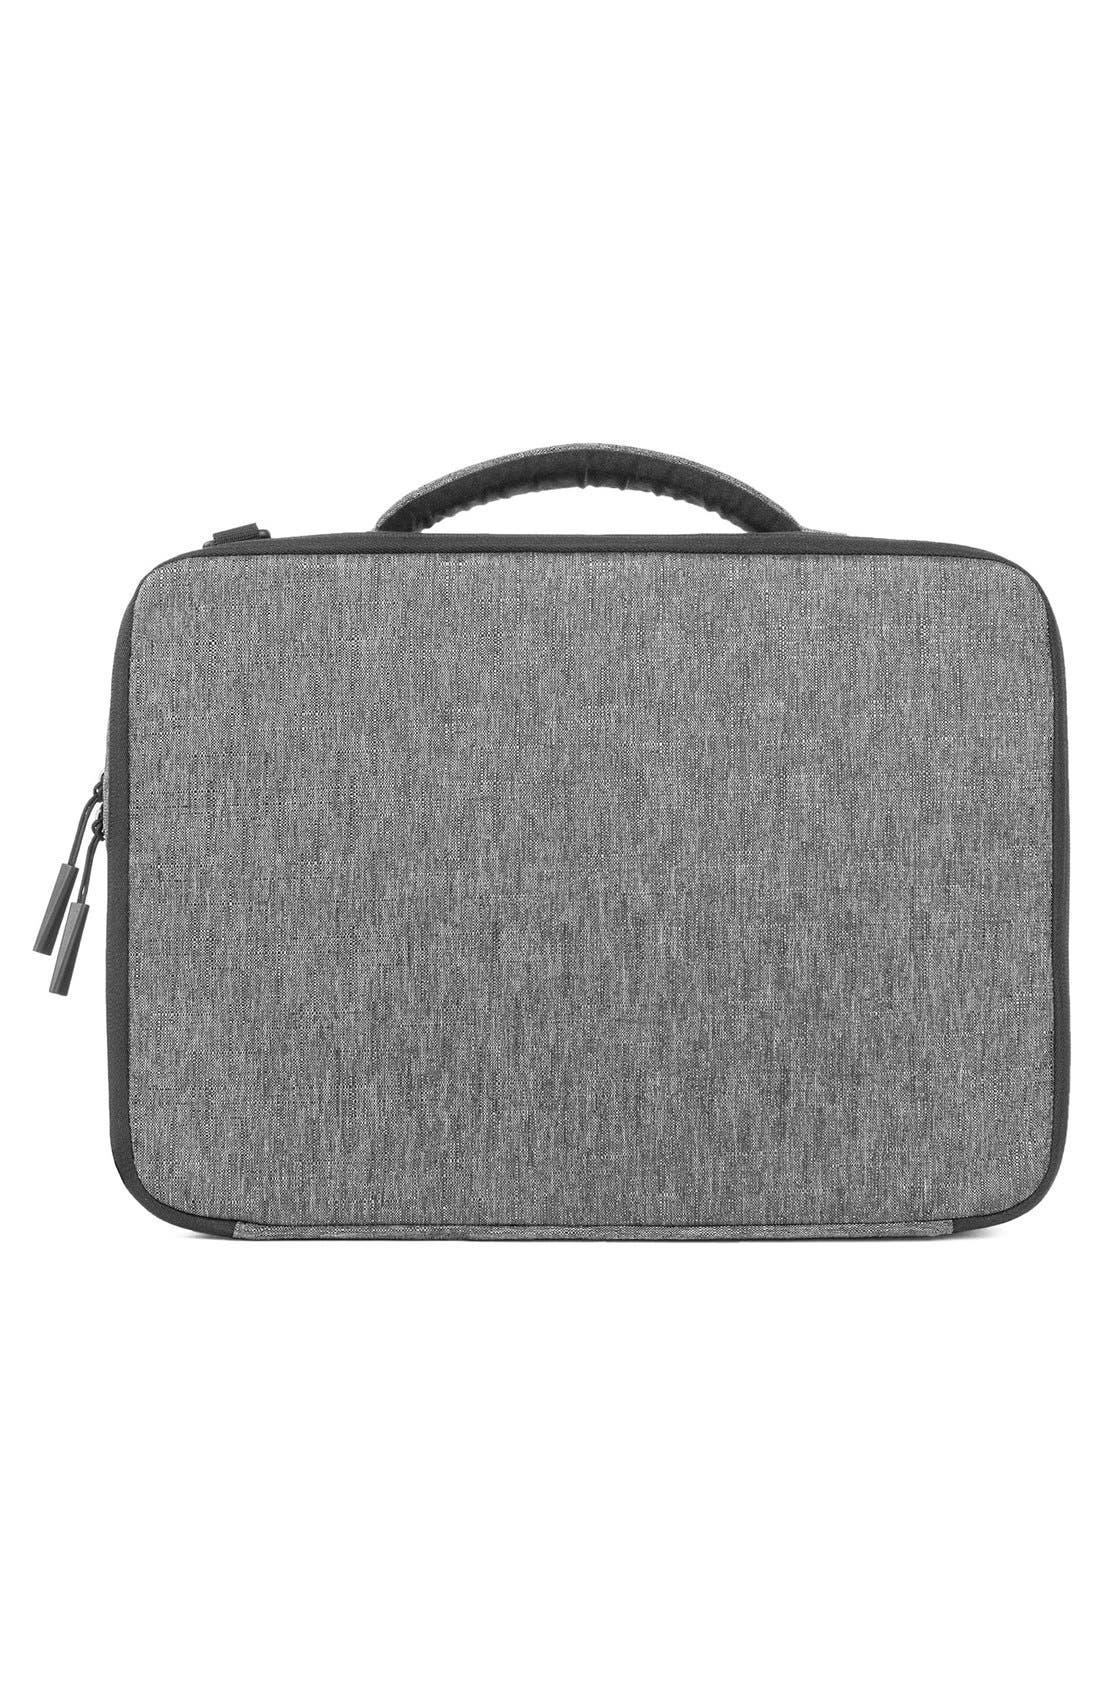 "Alternate Image 2  - Incase Designs 'Reform' 13"" Laptop Briefcase"